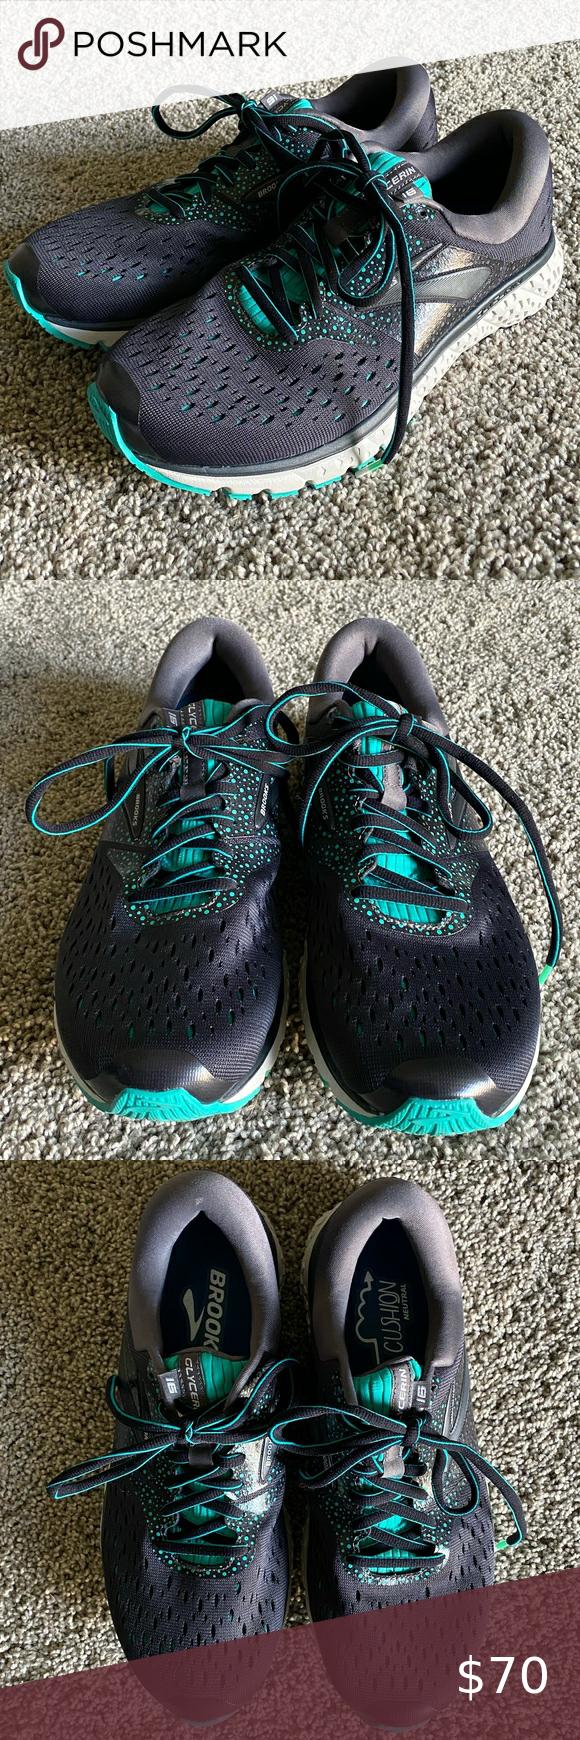 Women's Brooks Glycerin 16 Road Running Shoes in 2020